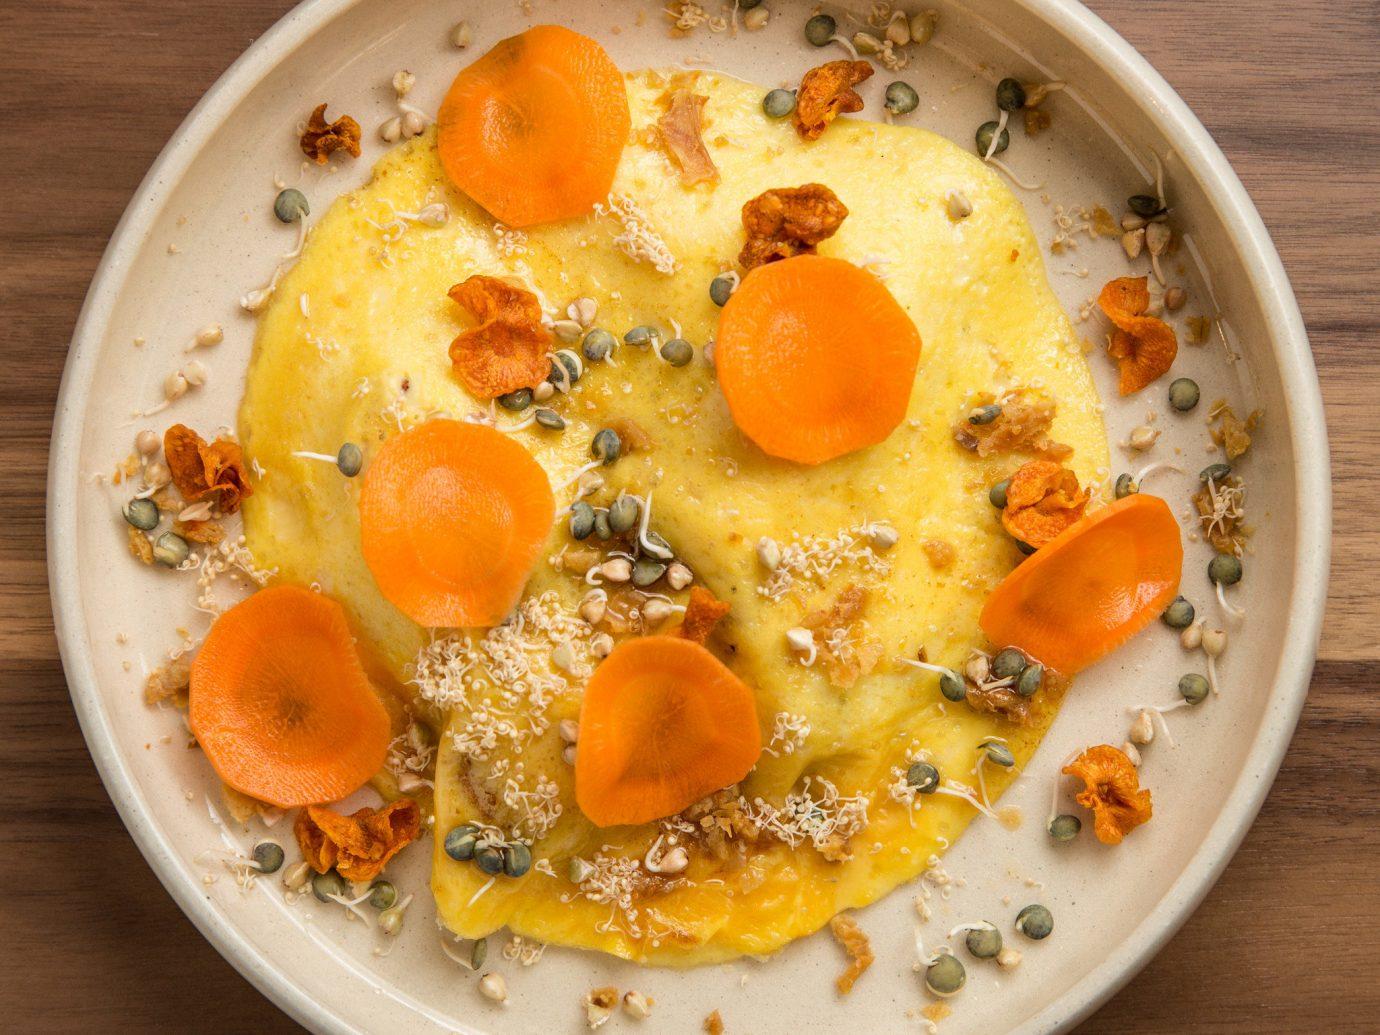 Food + Drink table food dish plate plant produce wooden meal land plant vegetable breakfast flowering plant orange eaten